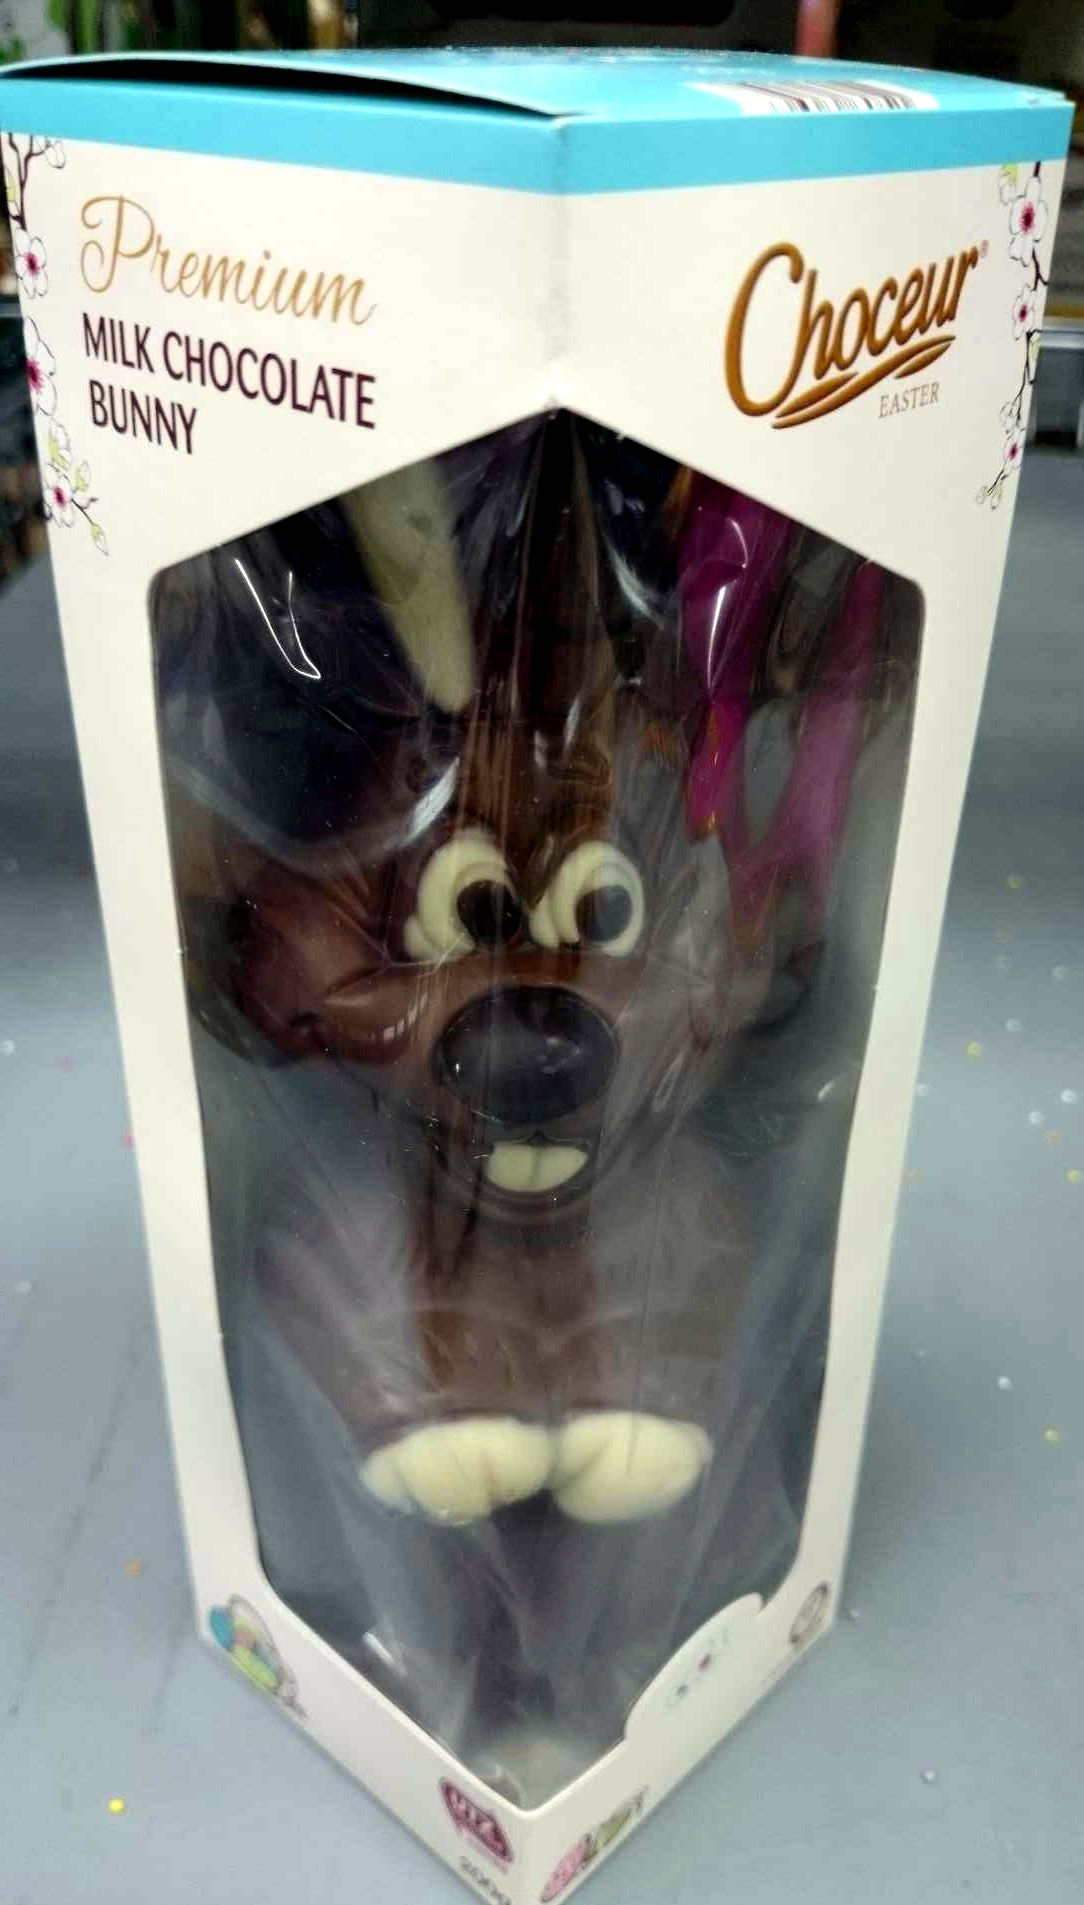 Premium Milk Chocolate Bunny - Product